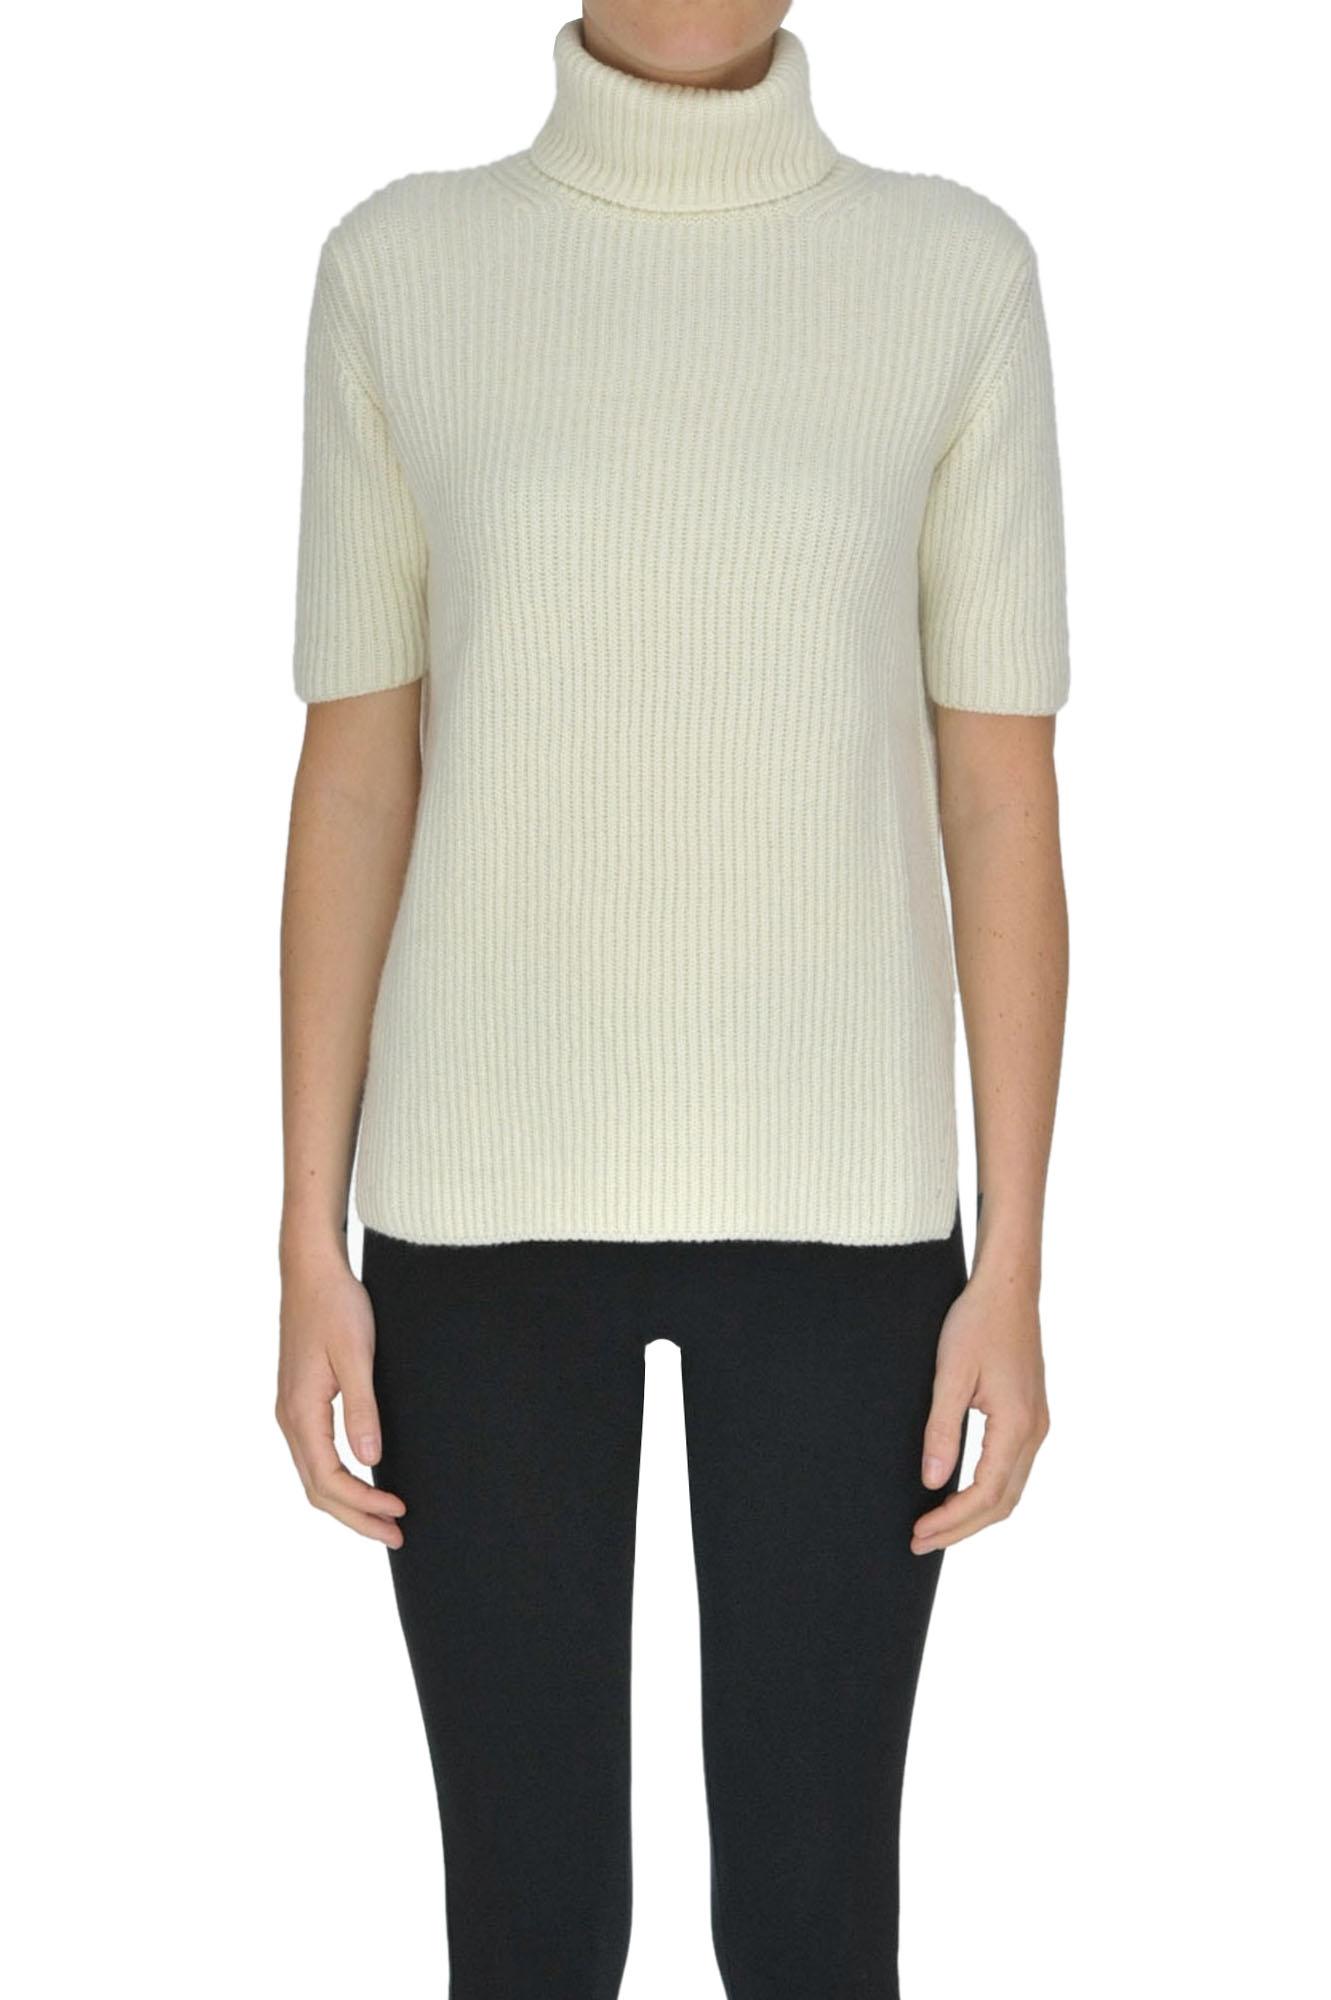 ALYKI Turtleneck Cashmere Pullover in Cream